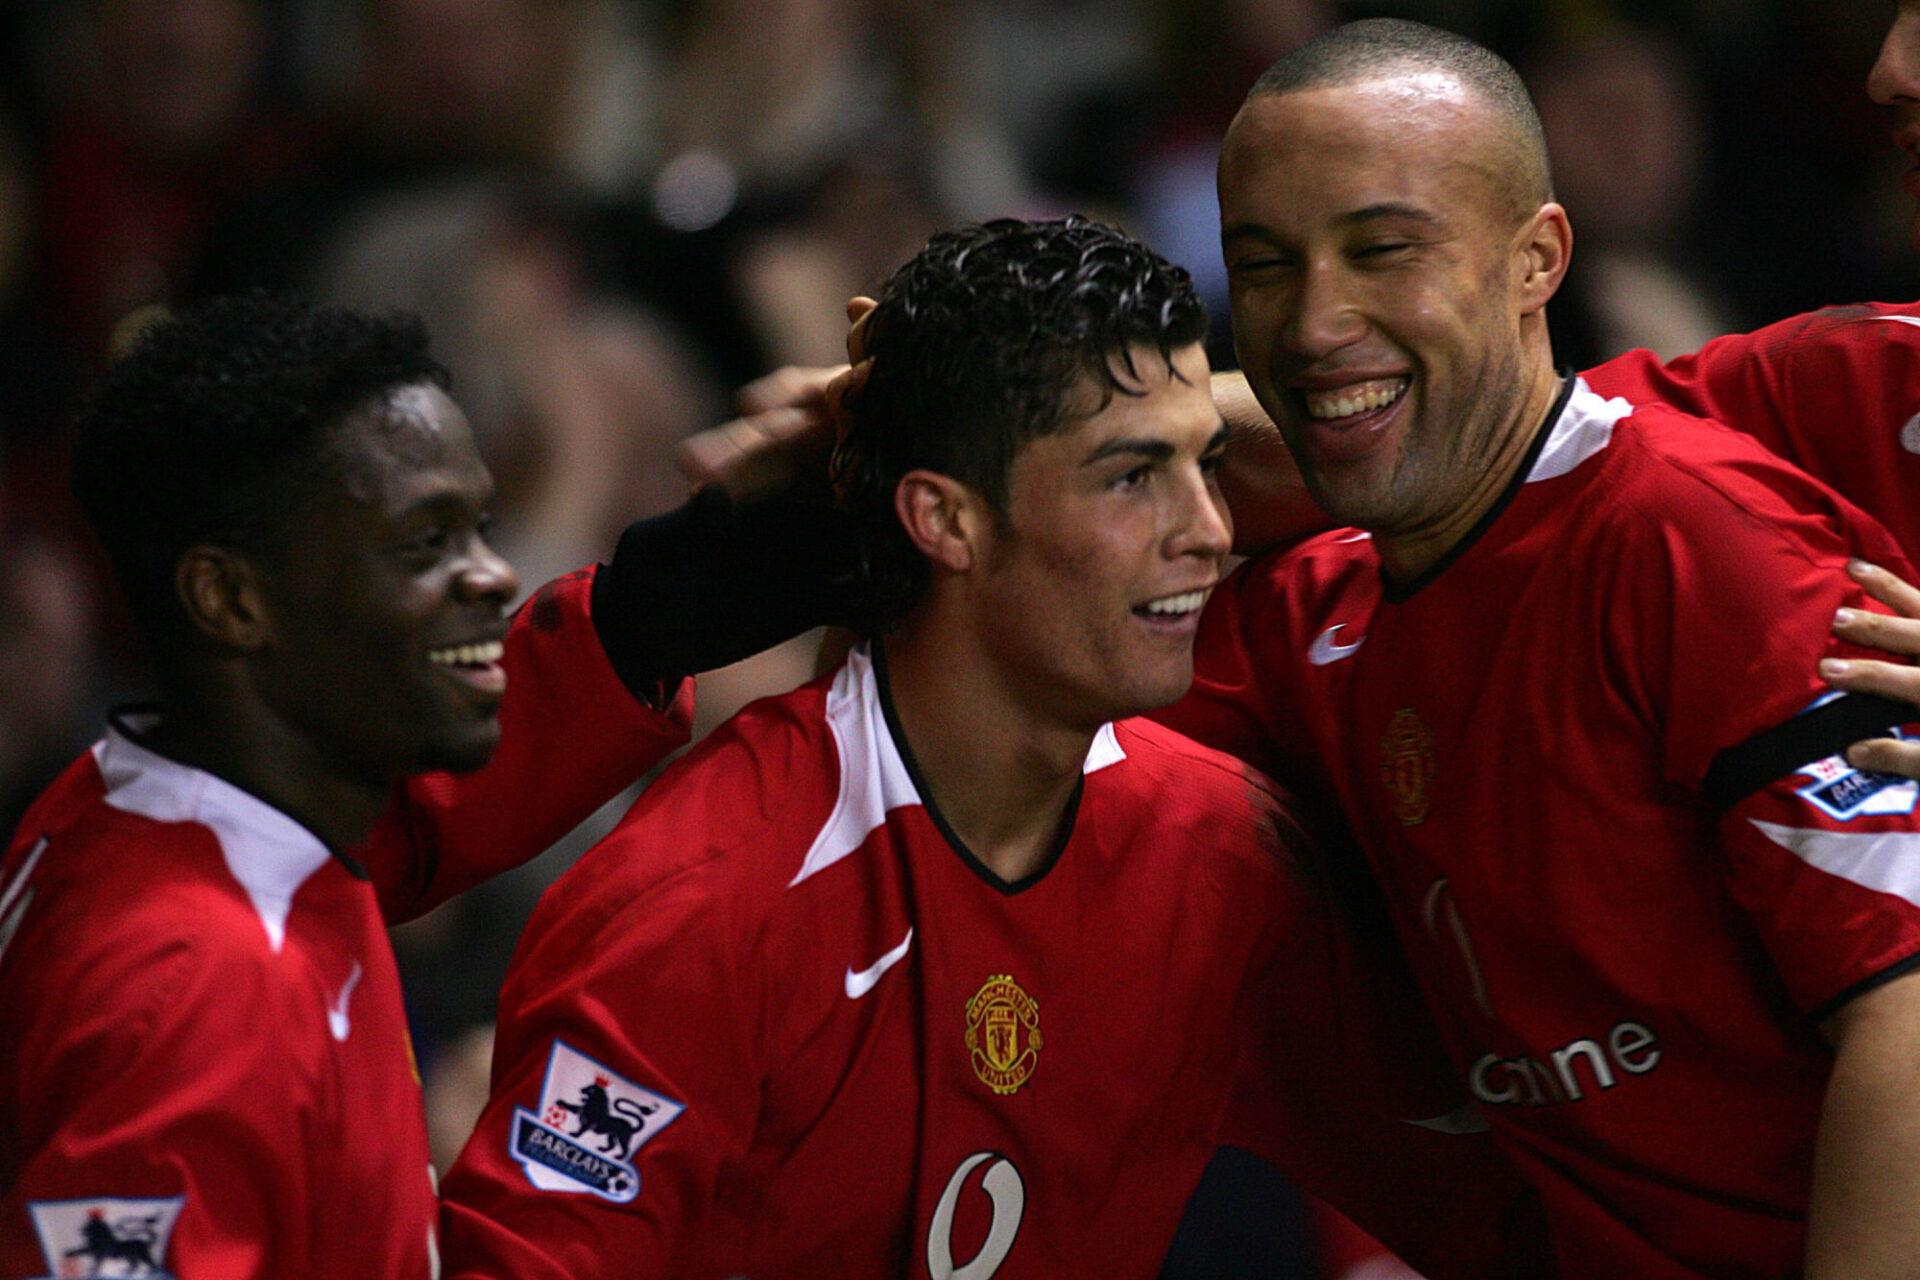 Cristiano Ronaldo devrait faire son retour sous le maillot de Manchester United face à Newcastle, ce samedi 11 septembre. Icon Sport